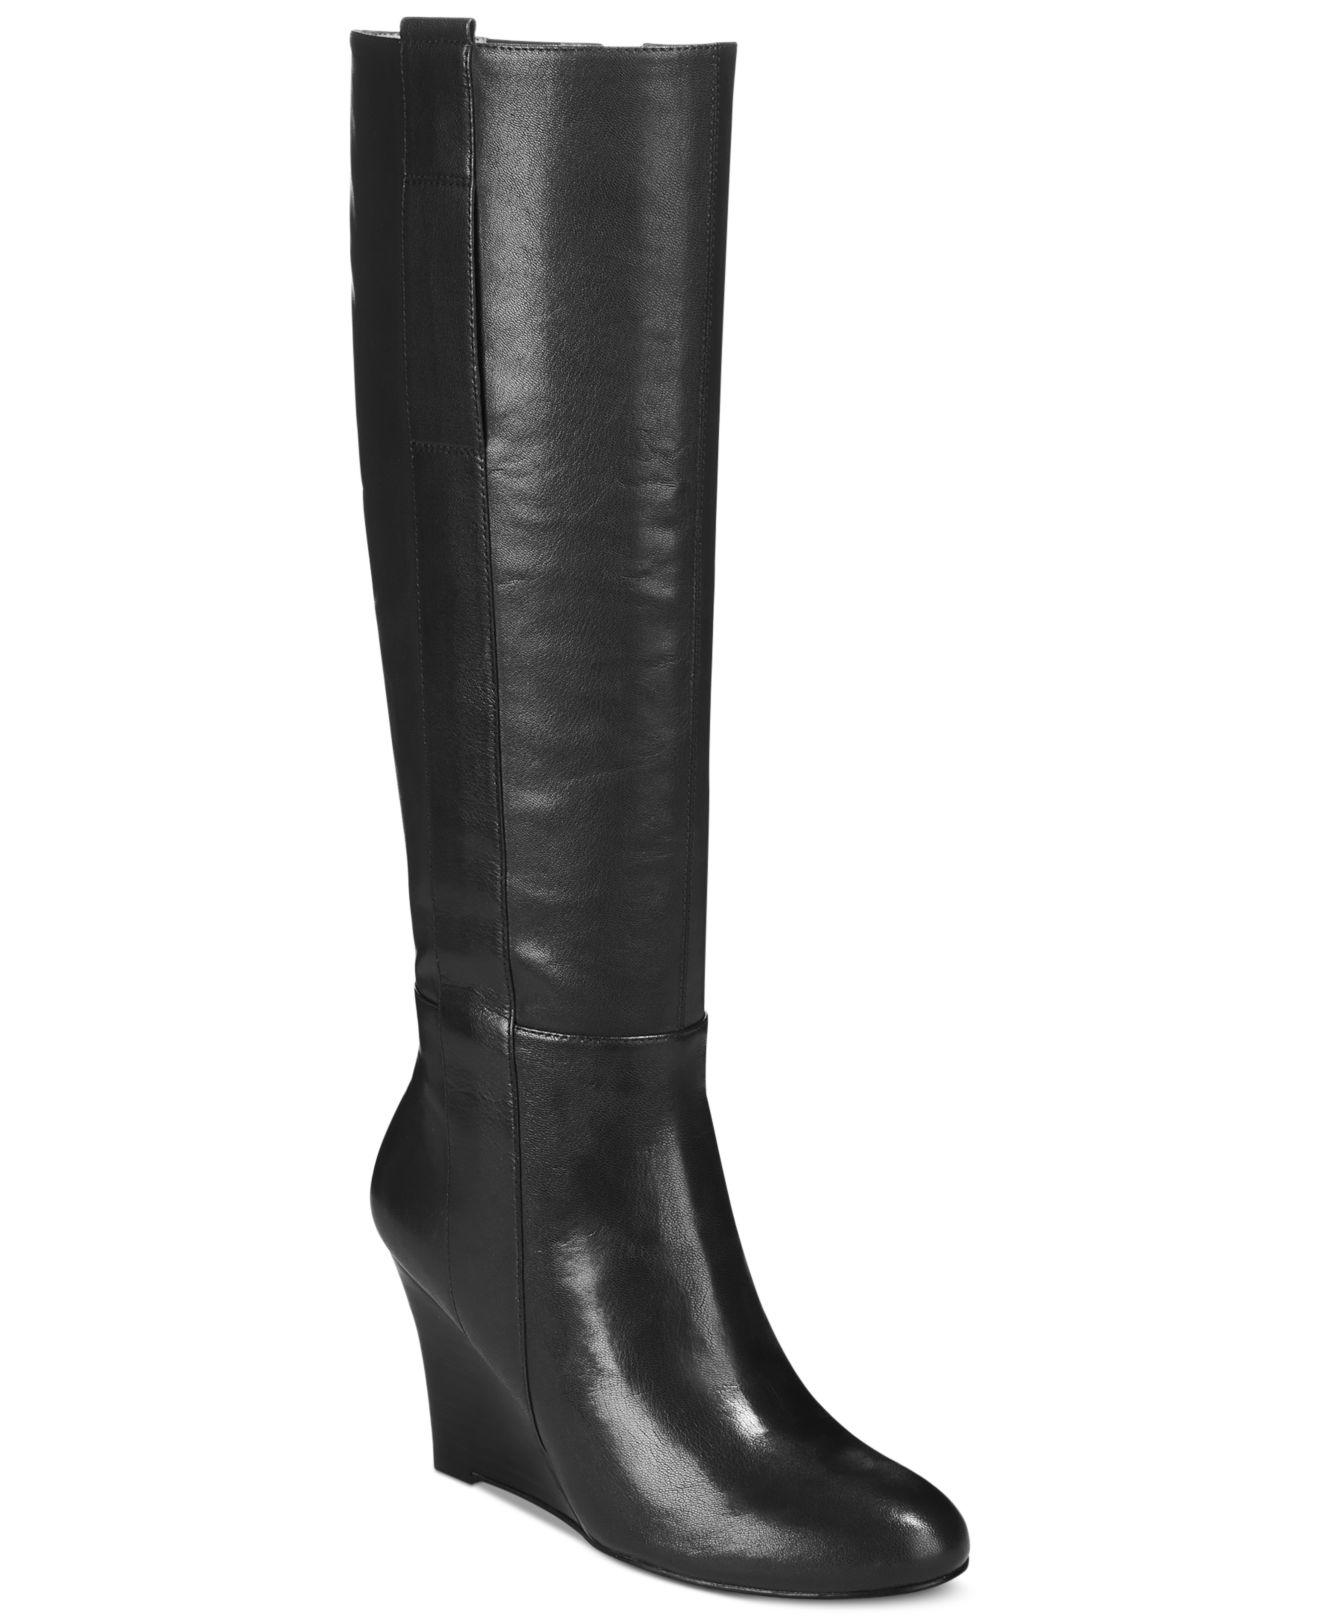 nine west oran wedge boots in black black leather